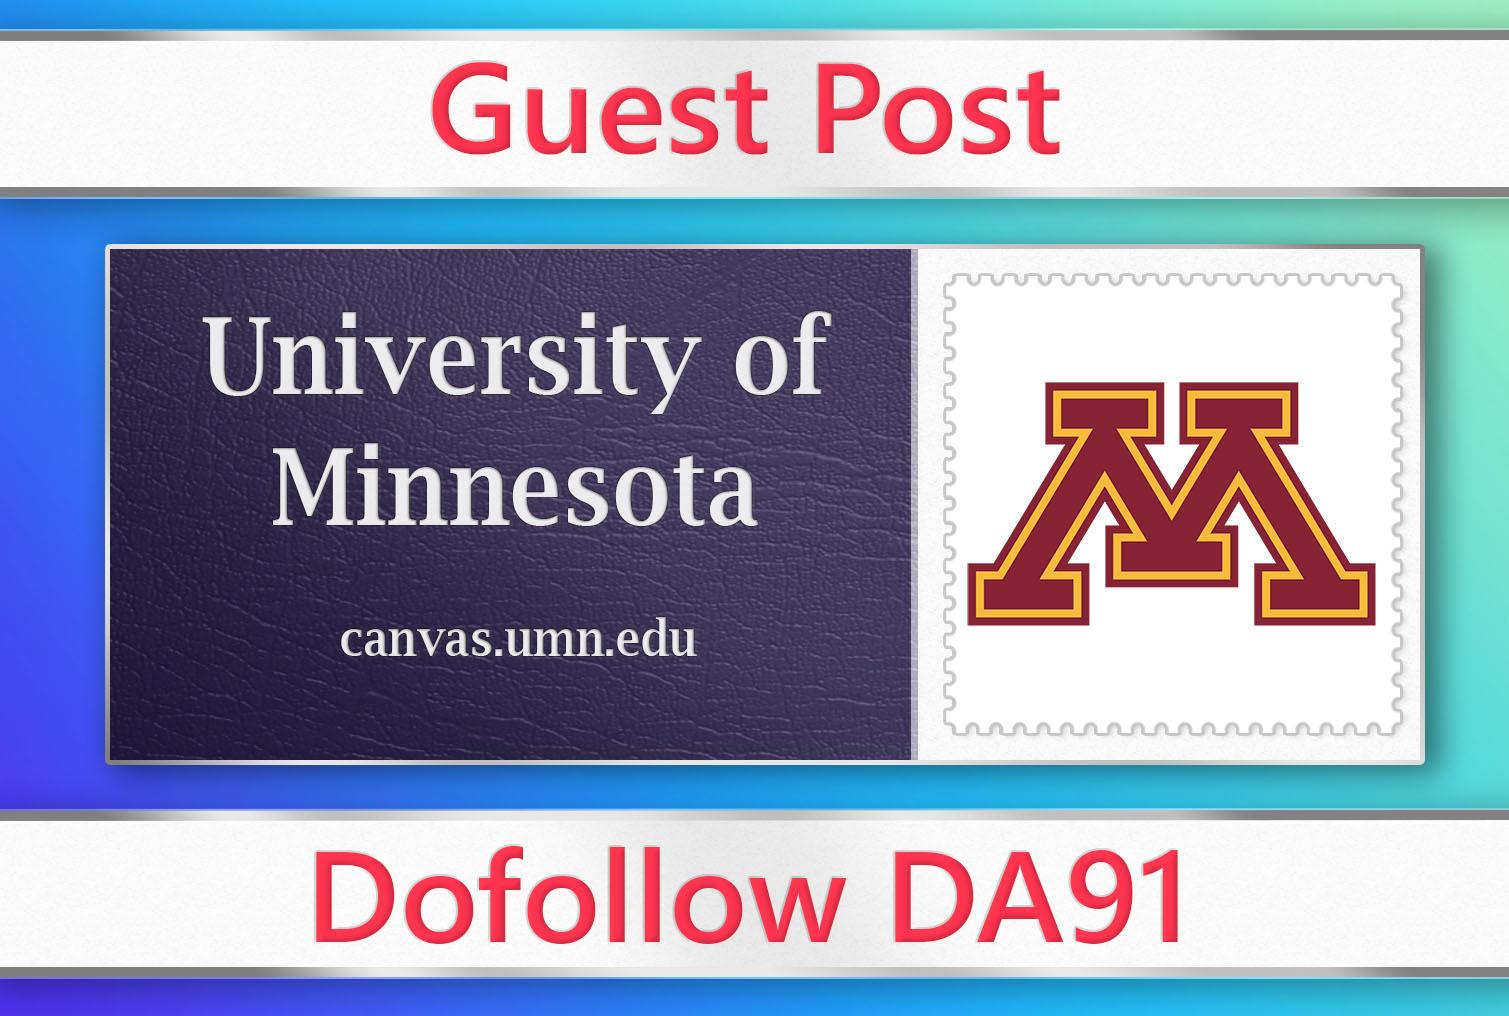 I will do permanent guest post on umn. edu DA 91